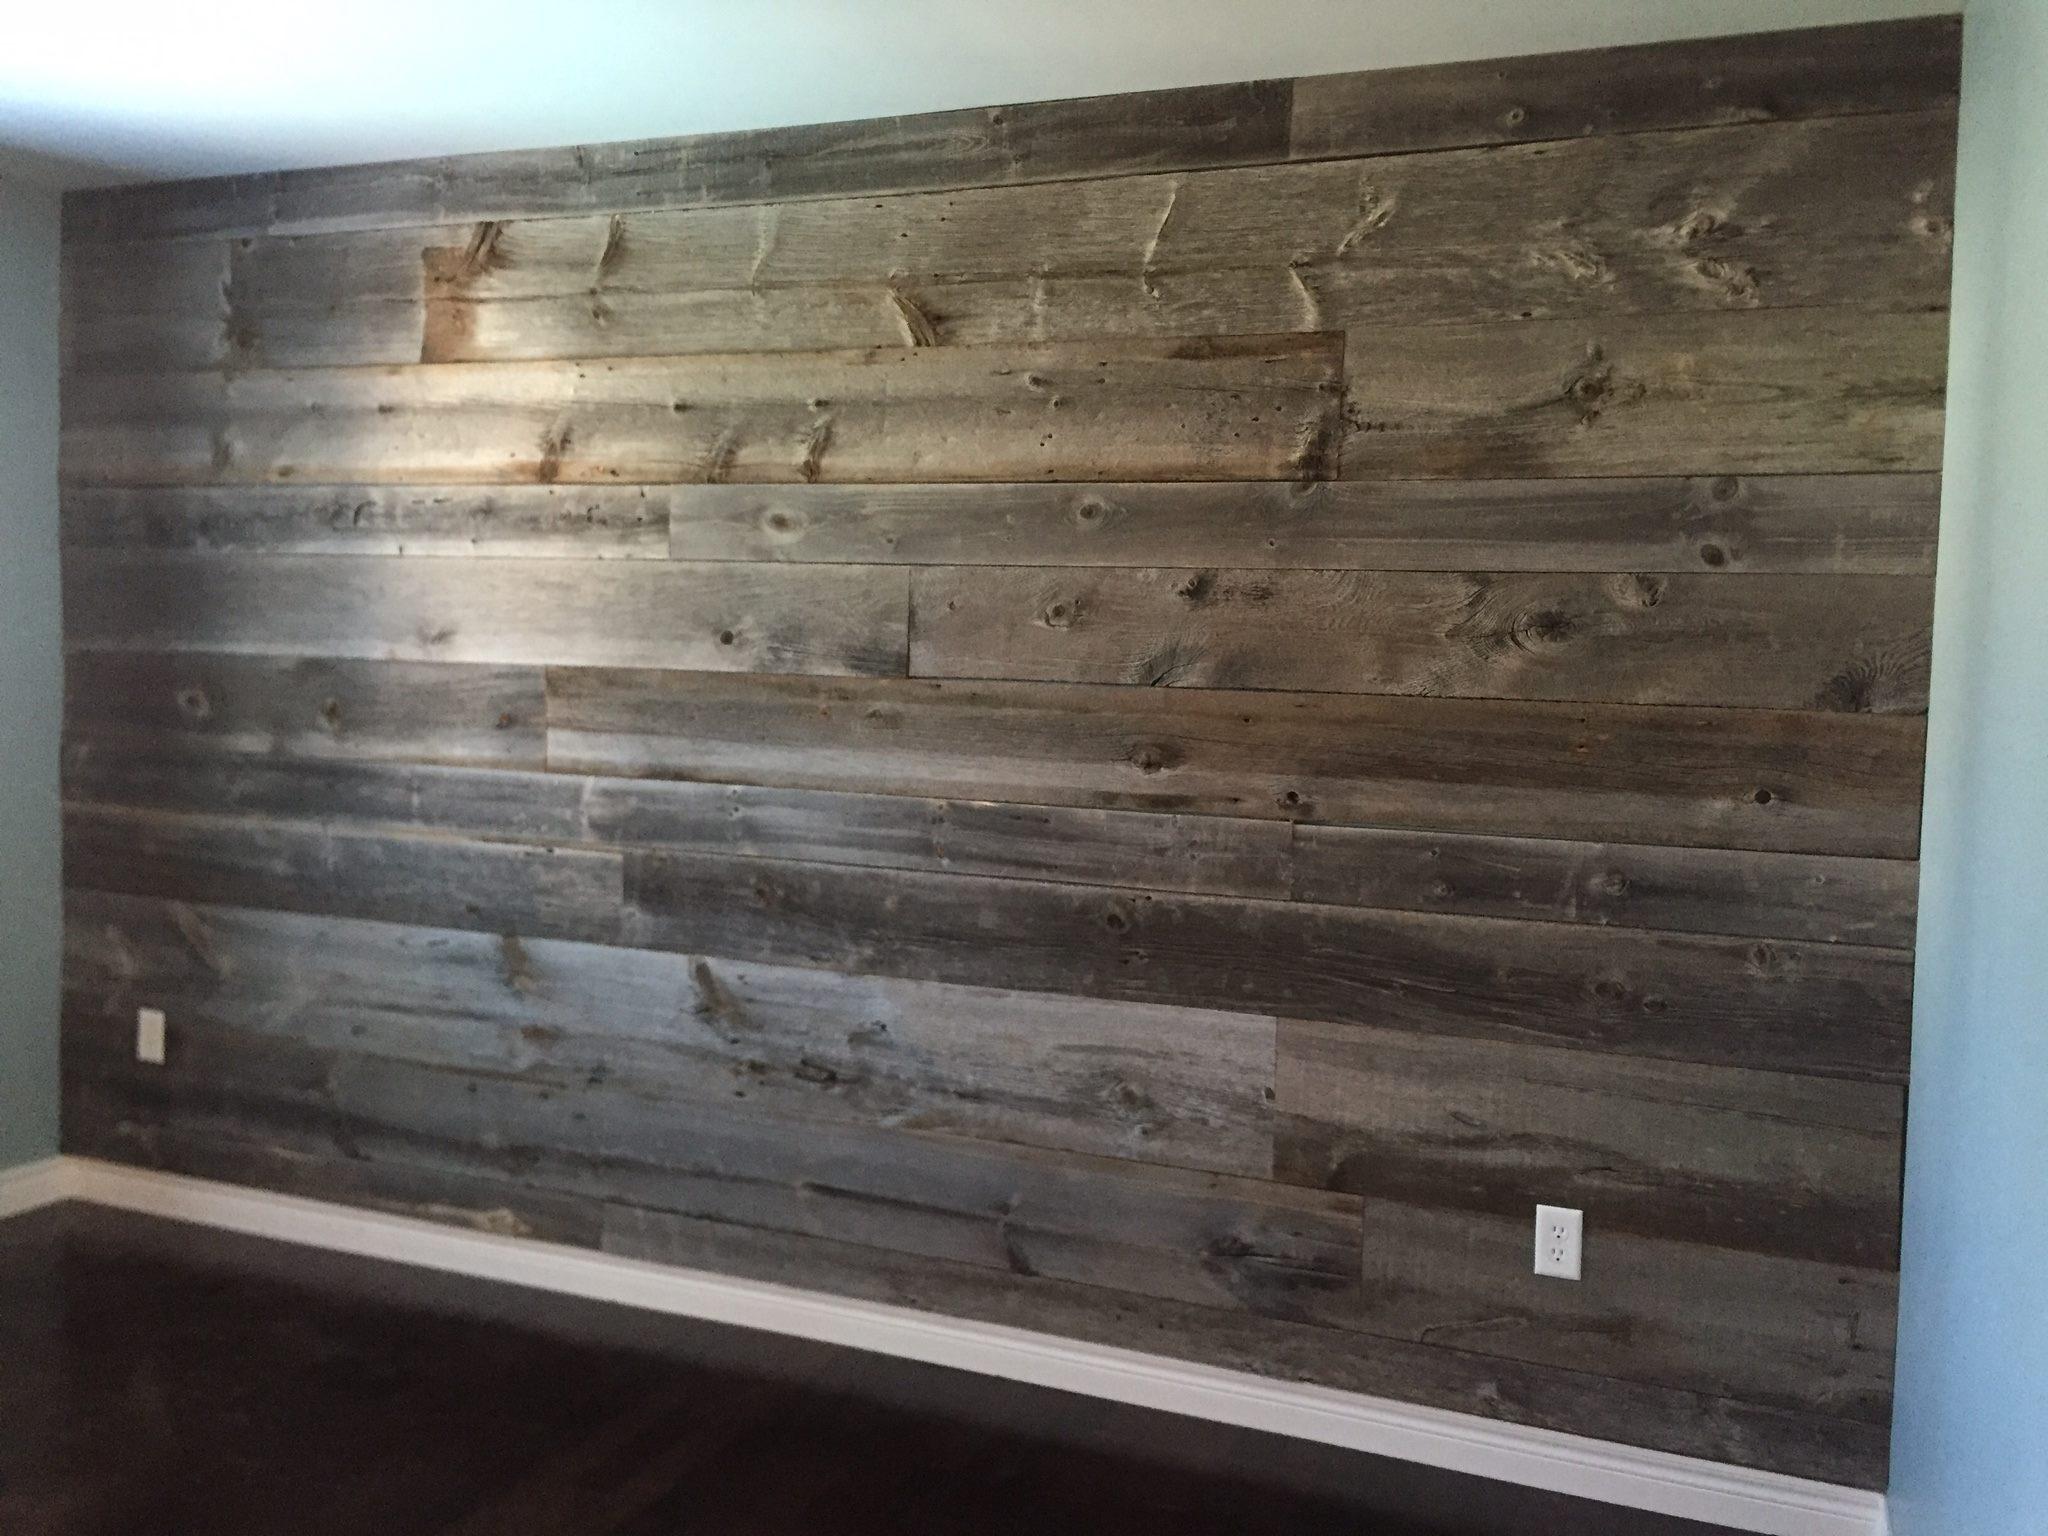 barn wall reclaimedoriginalfacewallplankkit products planks barns wood reclaimed kits walls paneling for